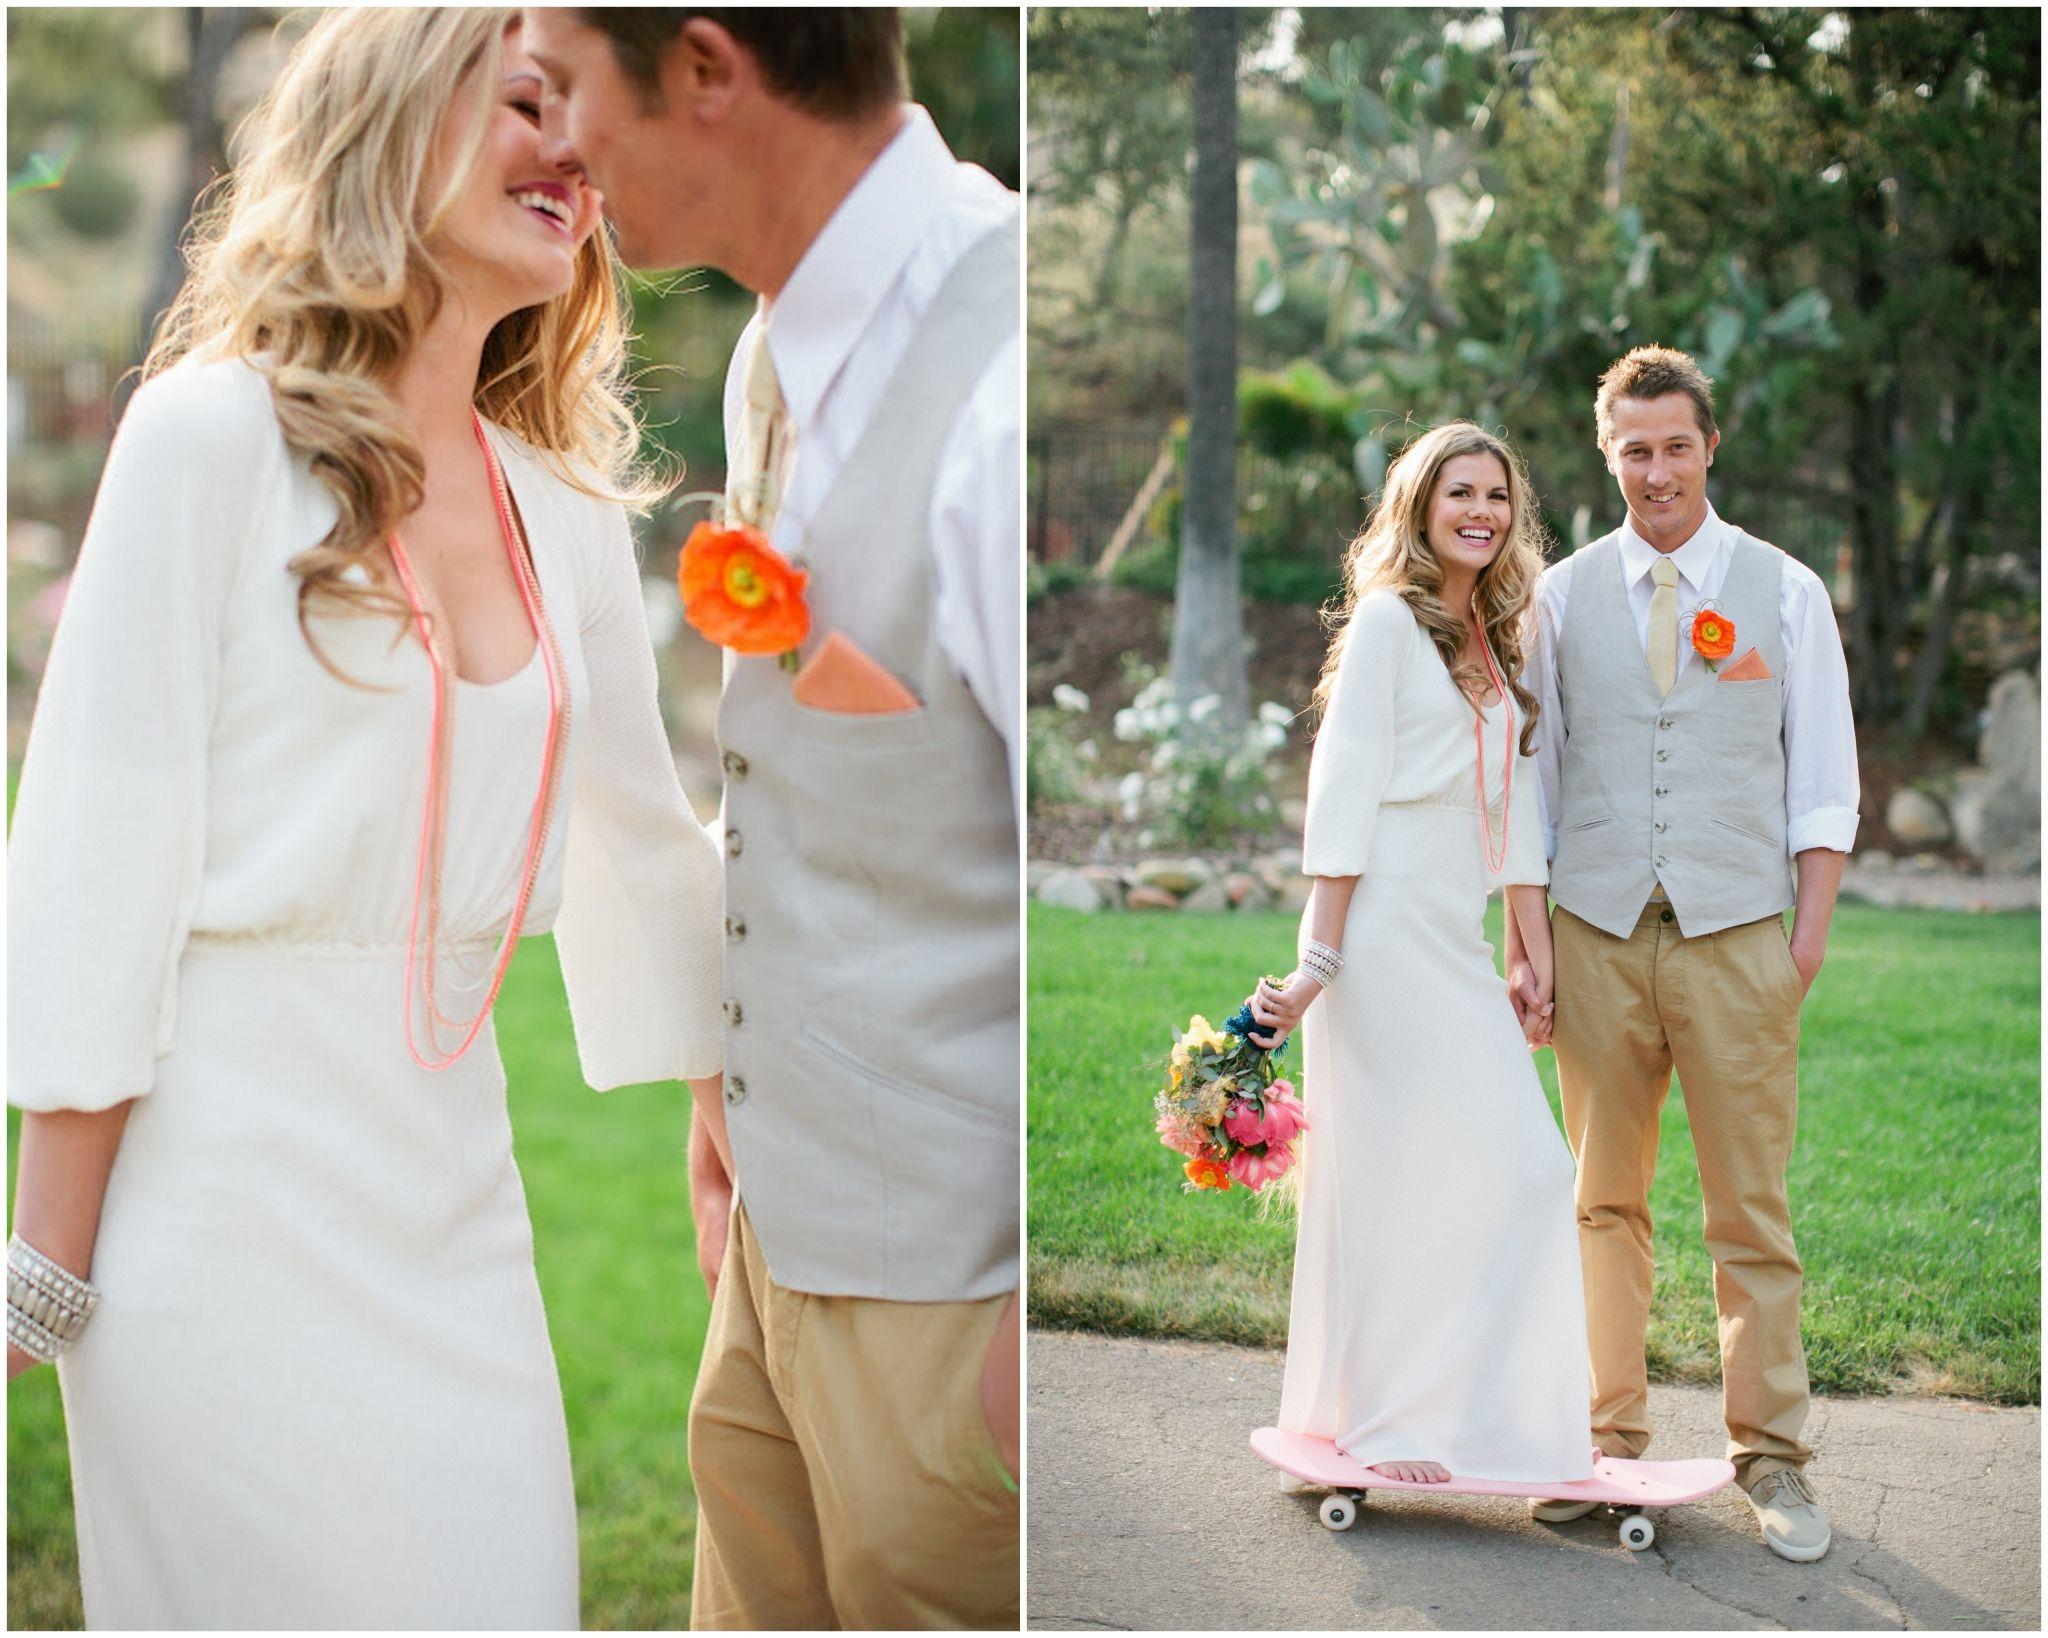 stone cold fox wedding dresses - informal wedding dresses for older ...